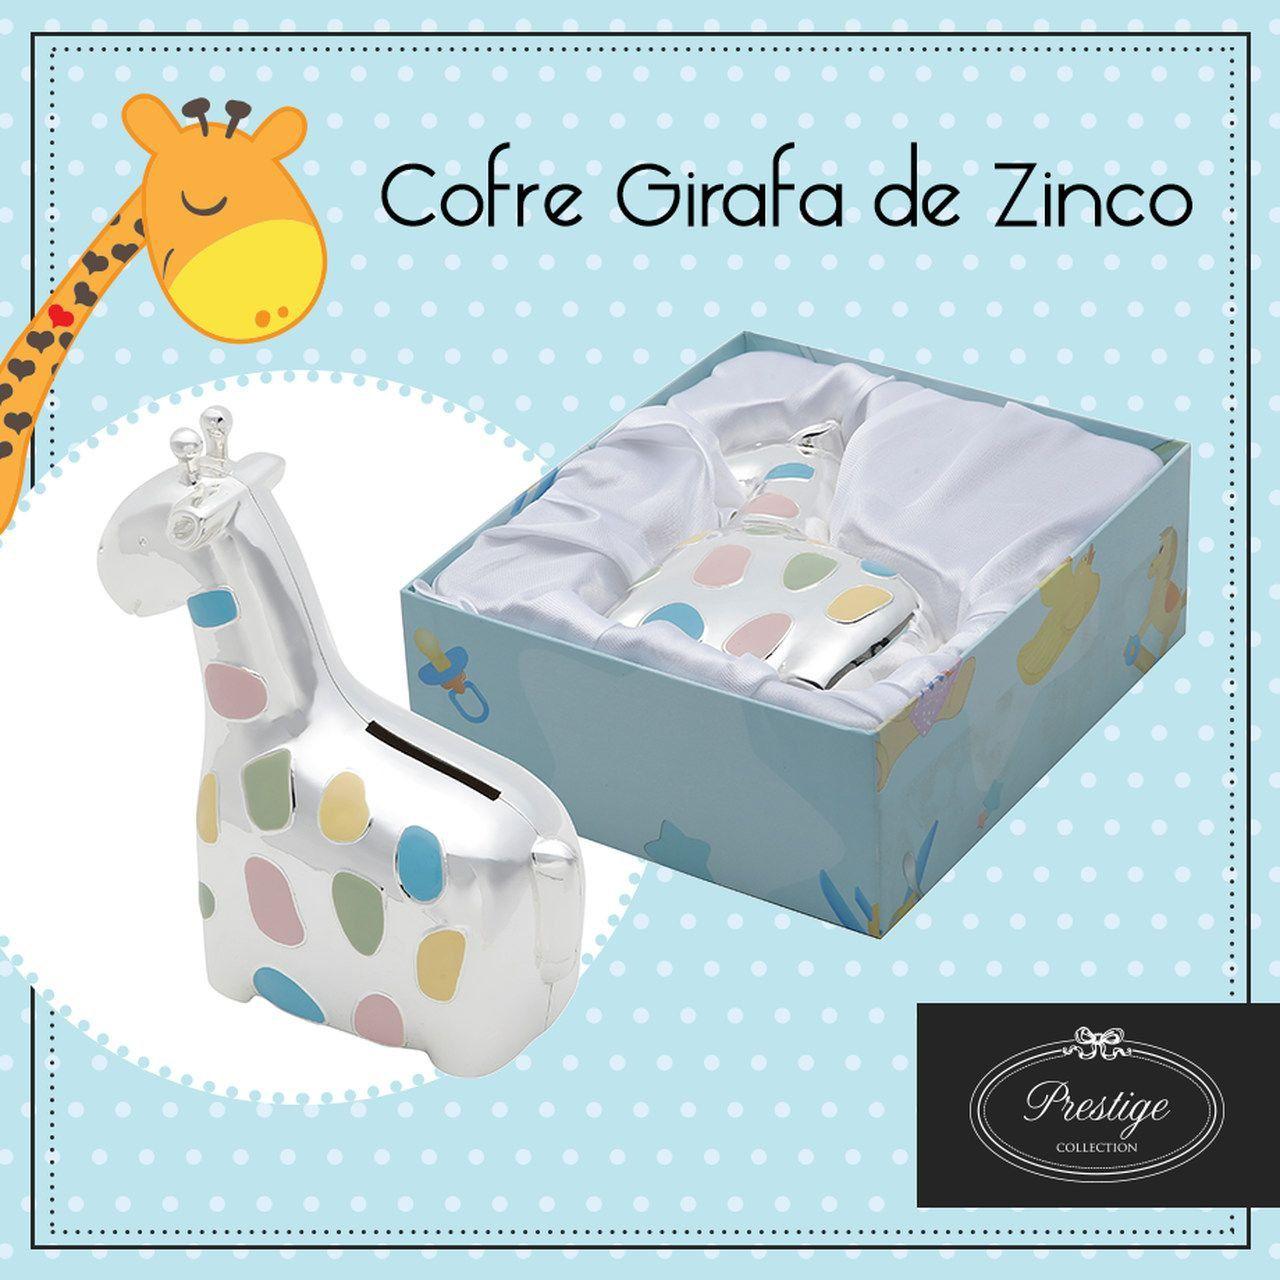 Cofre Girafa 15 cm de zamac prateado Prestige - 2957